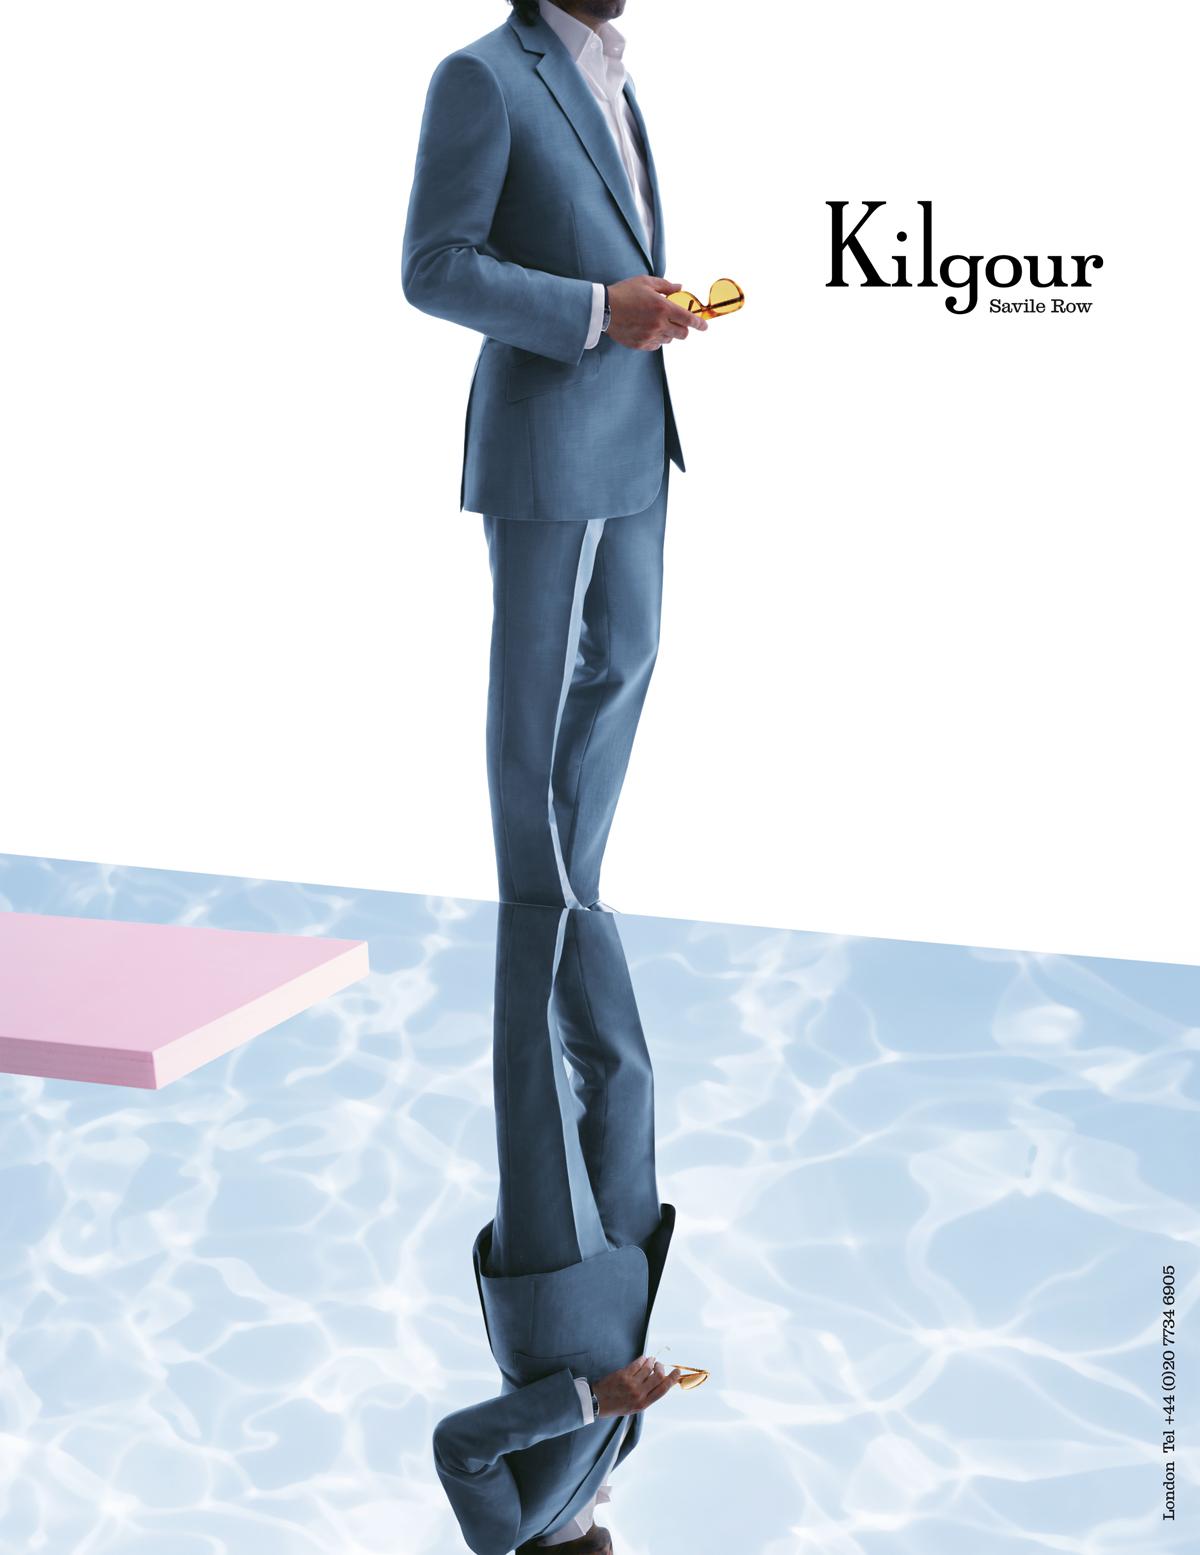 Kilgour - Hamilton 1200.jpg